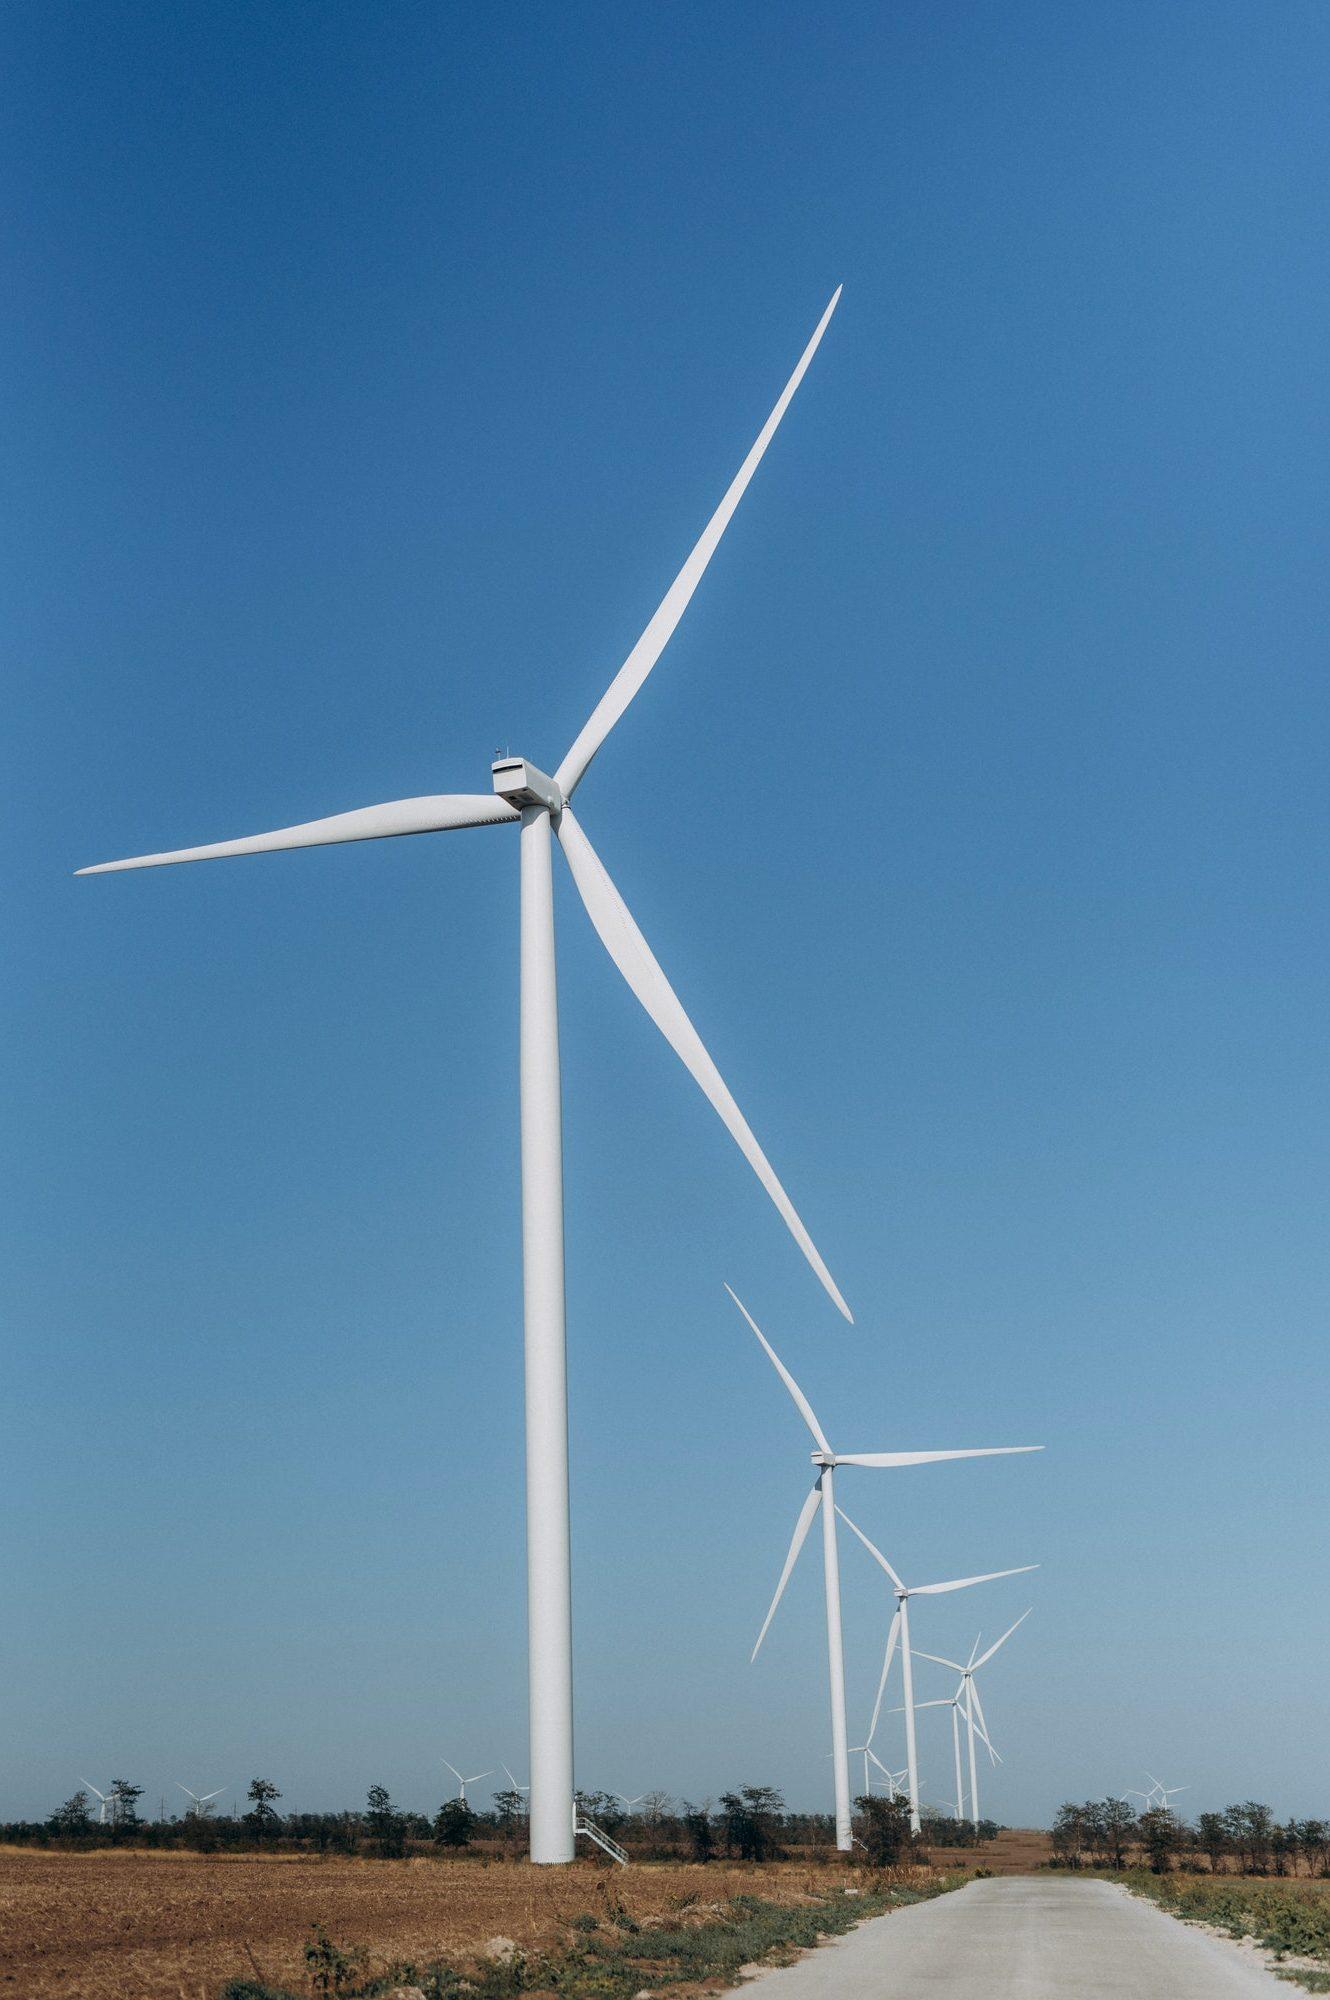 wind-power-station-loyal-generators-with-blades-e1616815782927.jpg